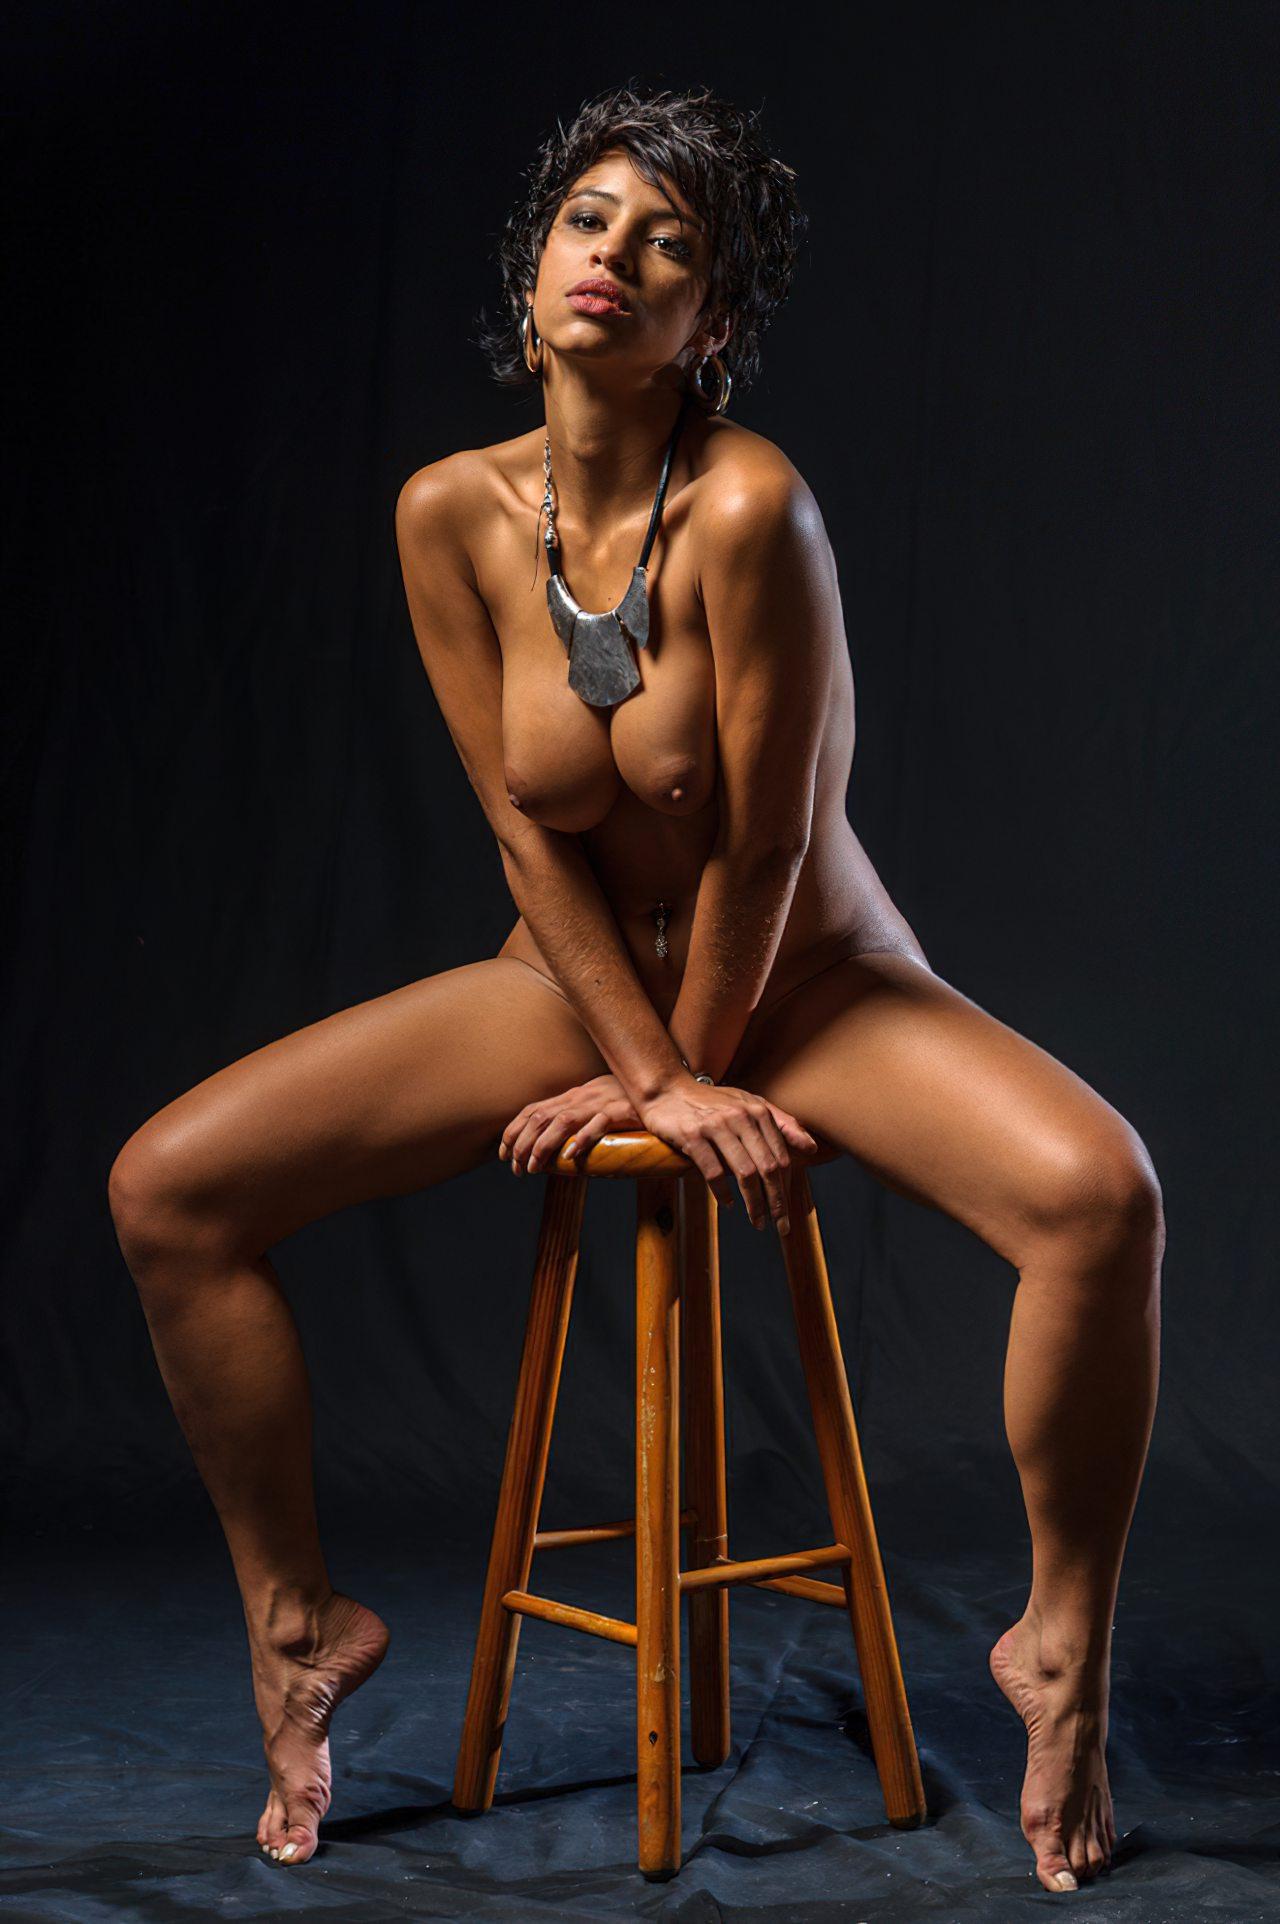 Mulher Morena Gostosa (1)